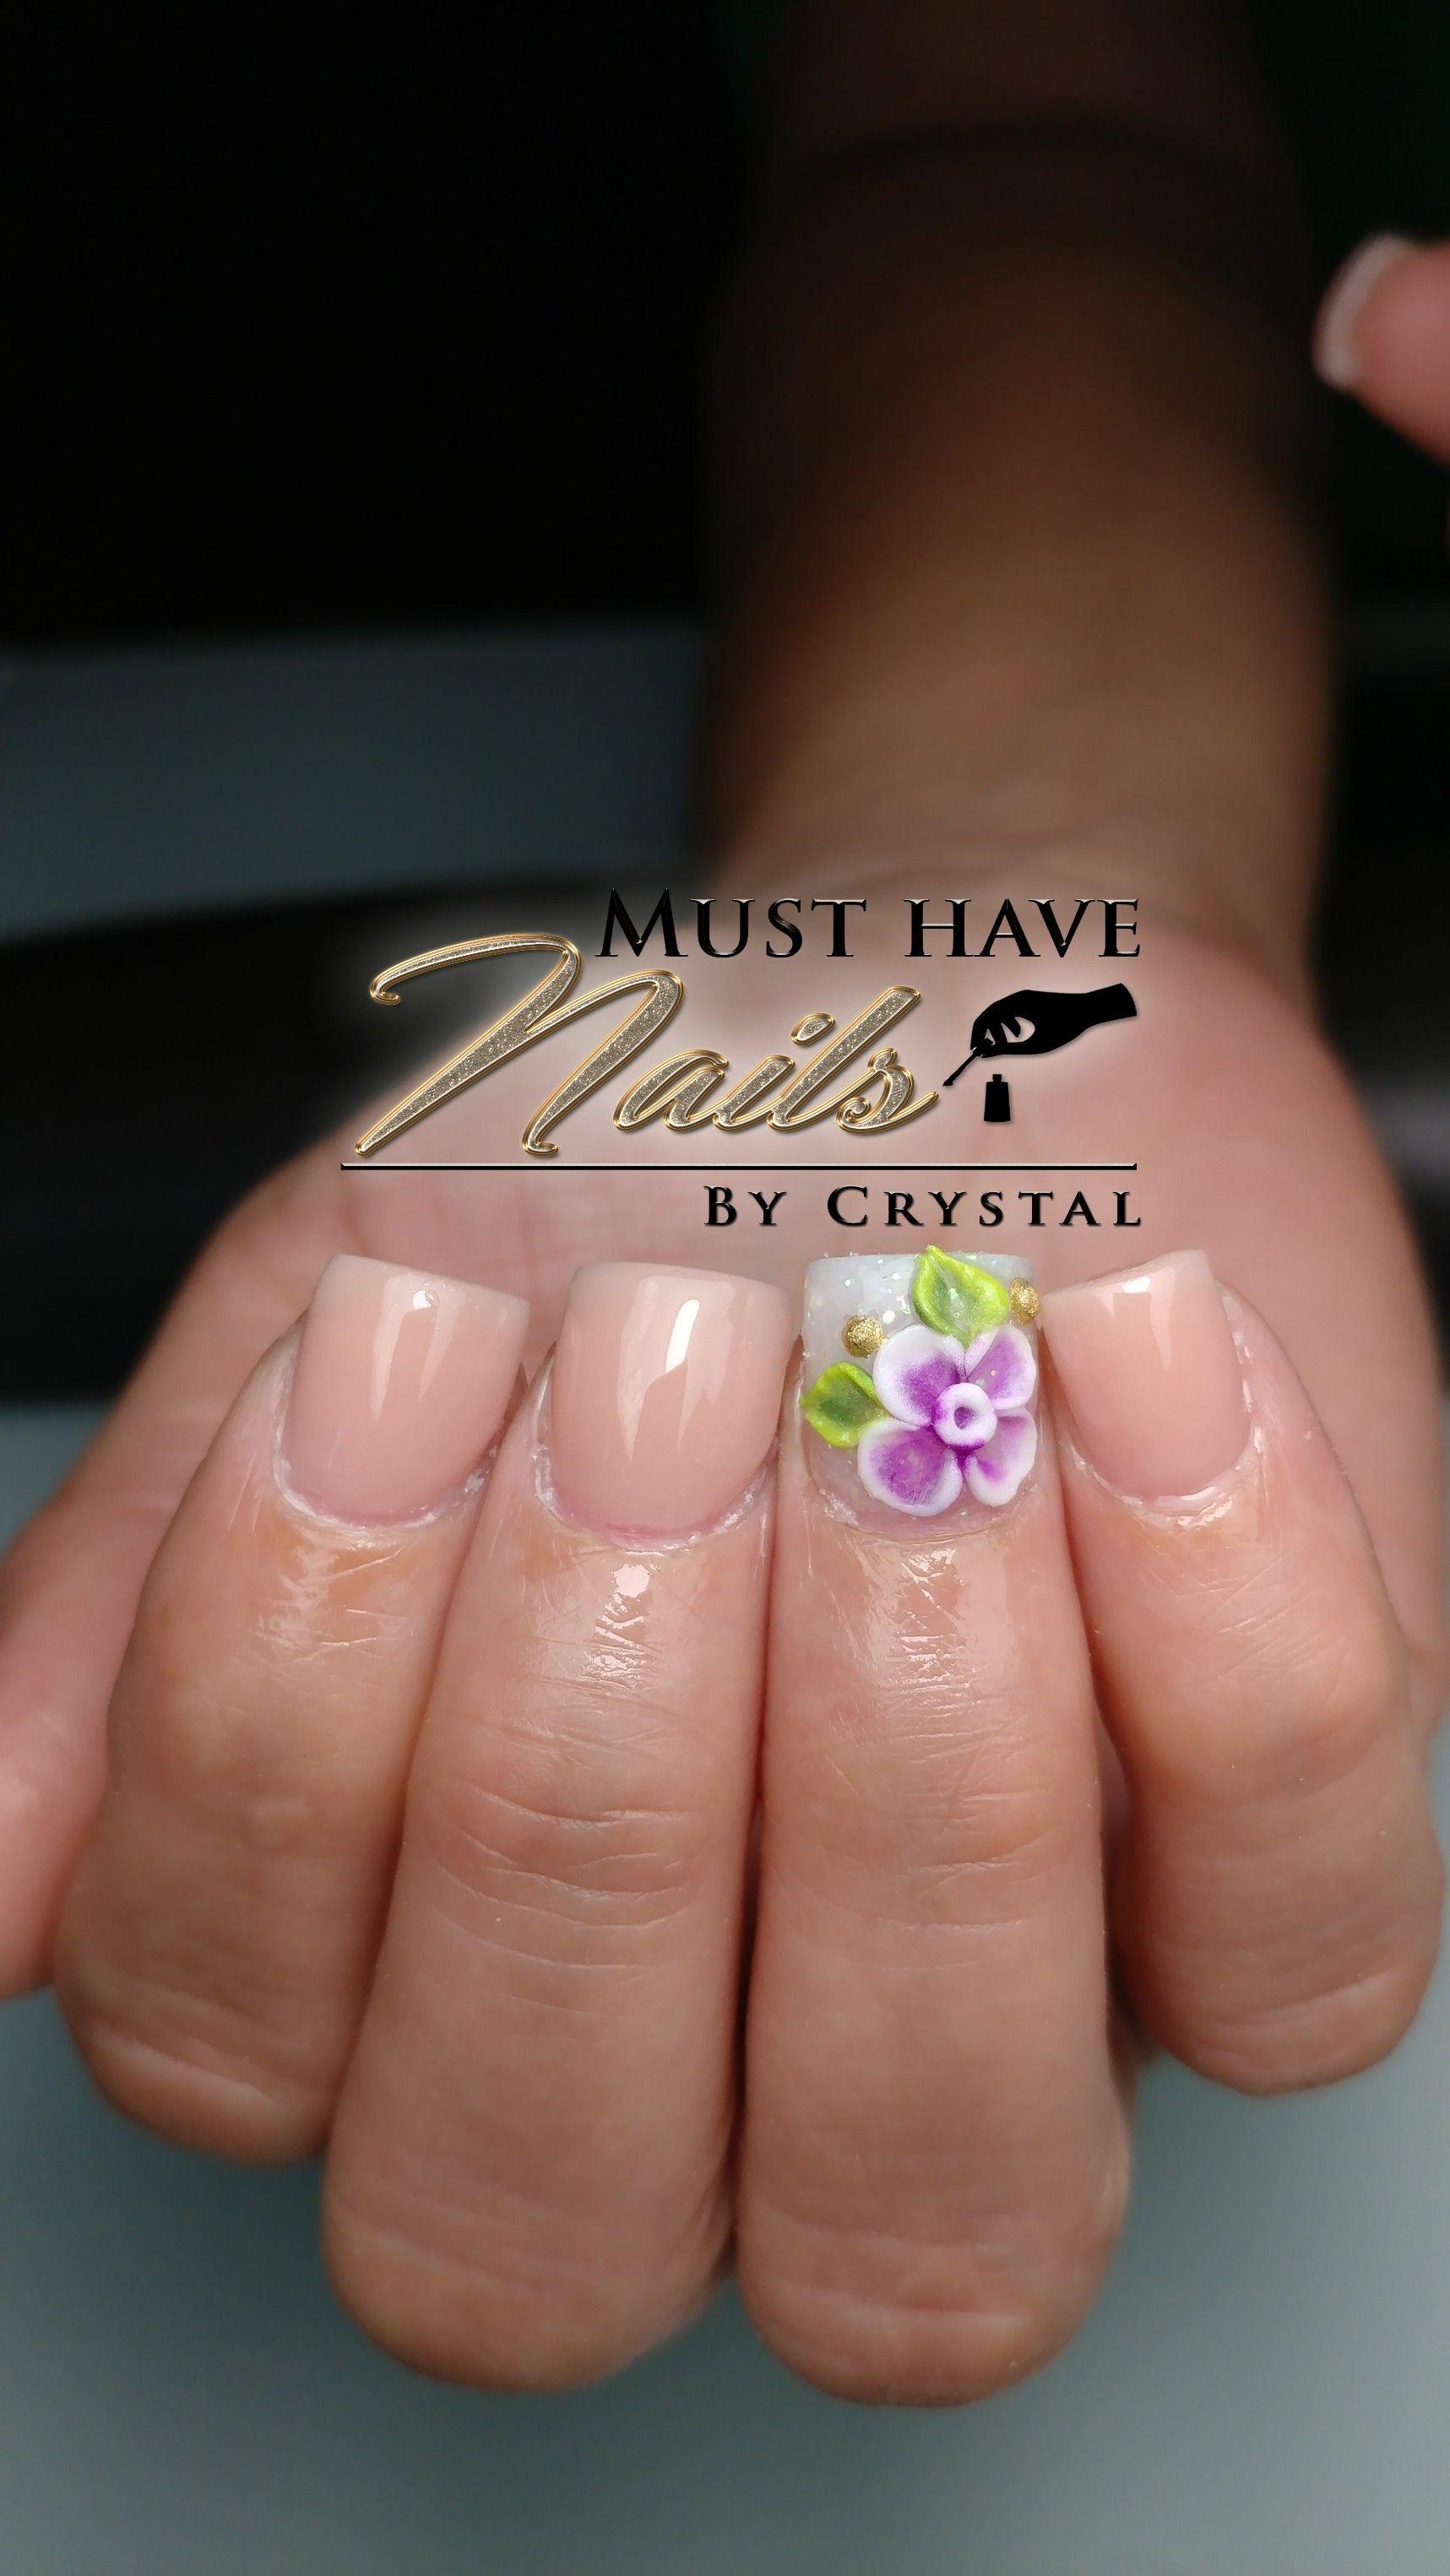 Check out what I made with #PicsArt | Nails Crystals Picsart